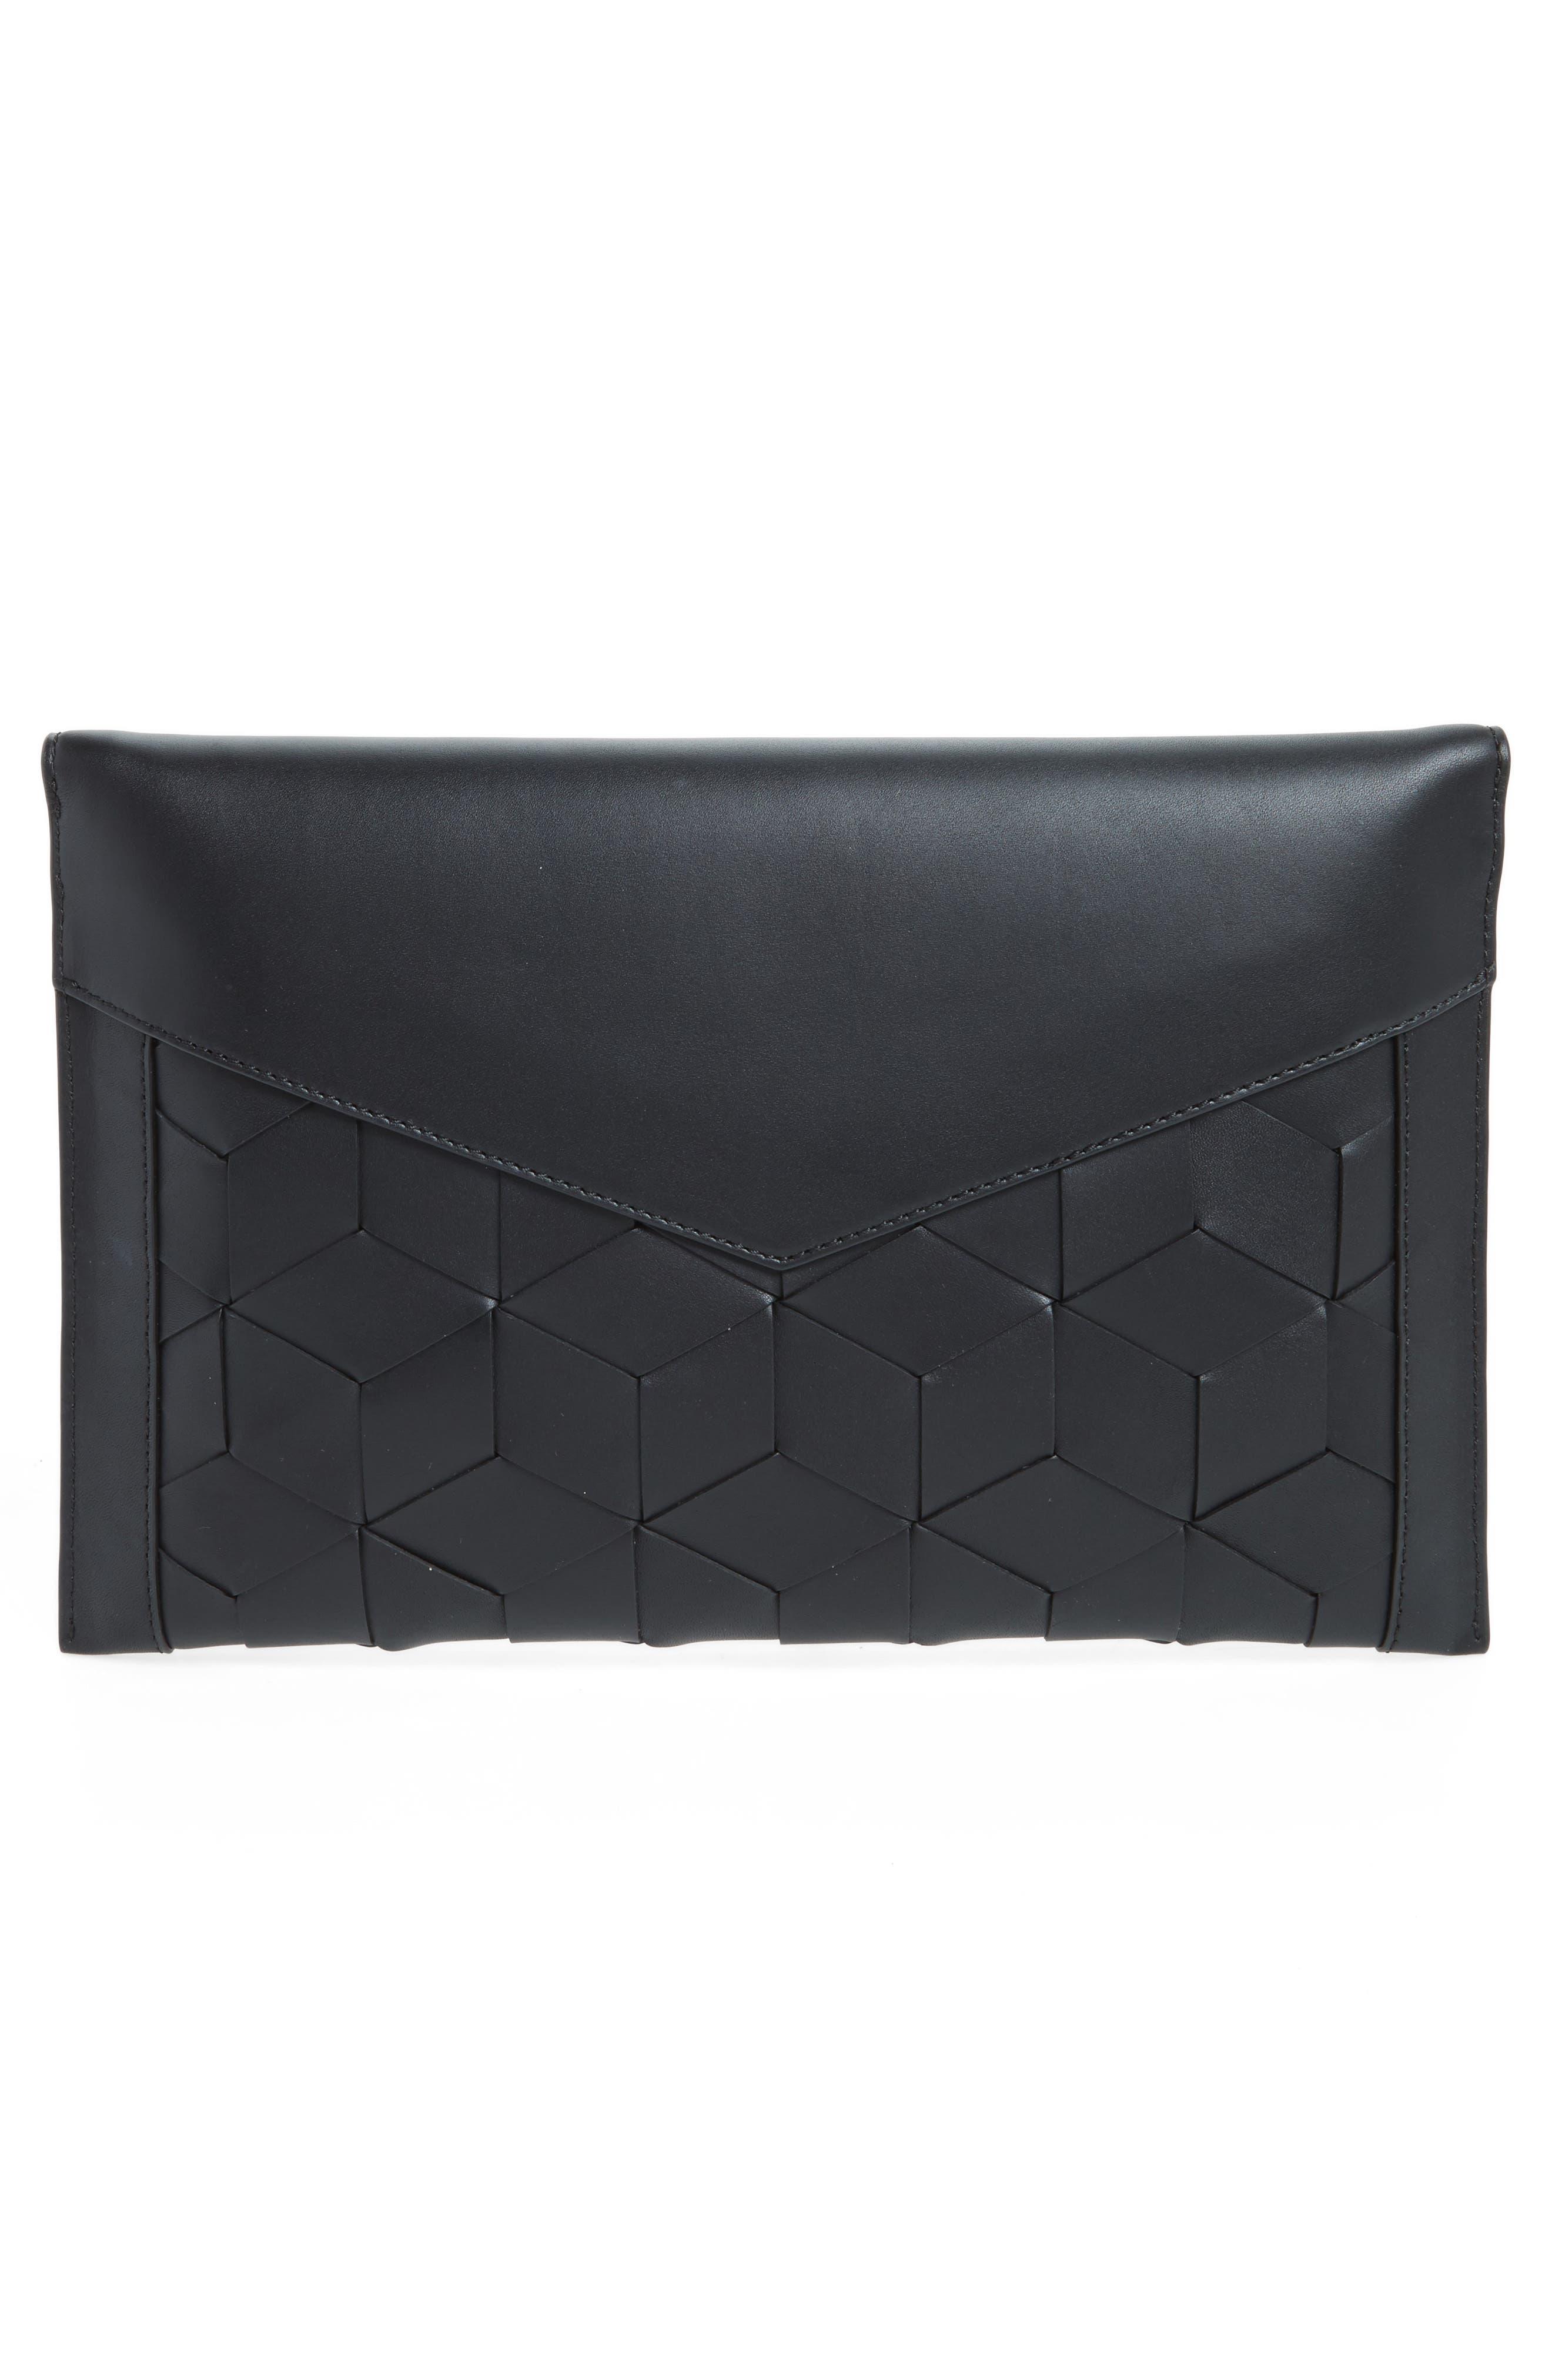 Mingle Woven Calfskin Leather Clutch,                             Alternate thumbnail 3, color,                             BLACK